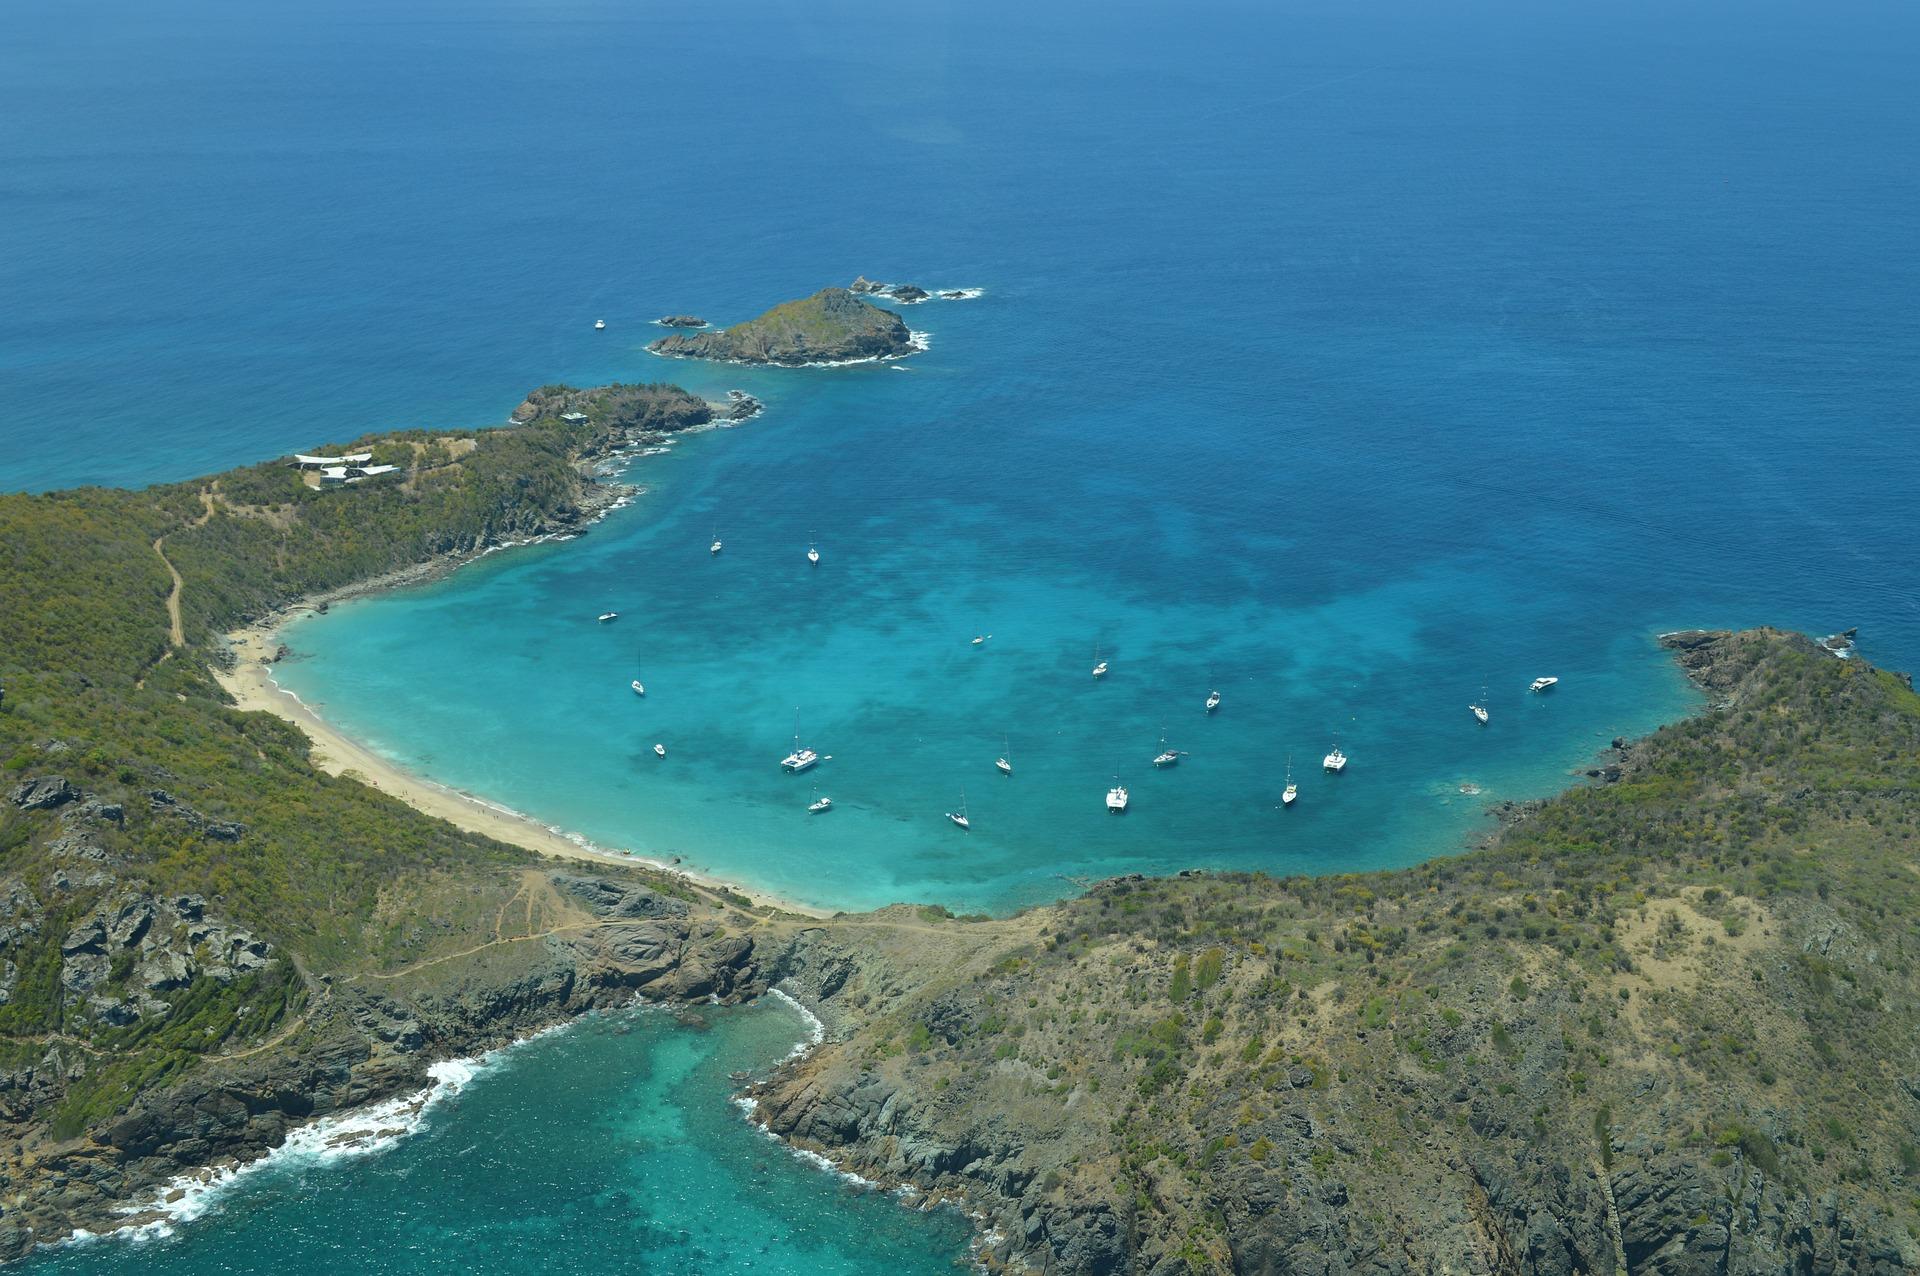 St. Barts honeymoon destination